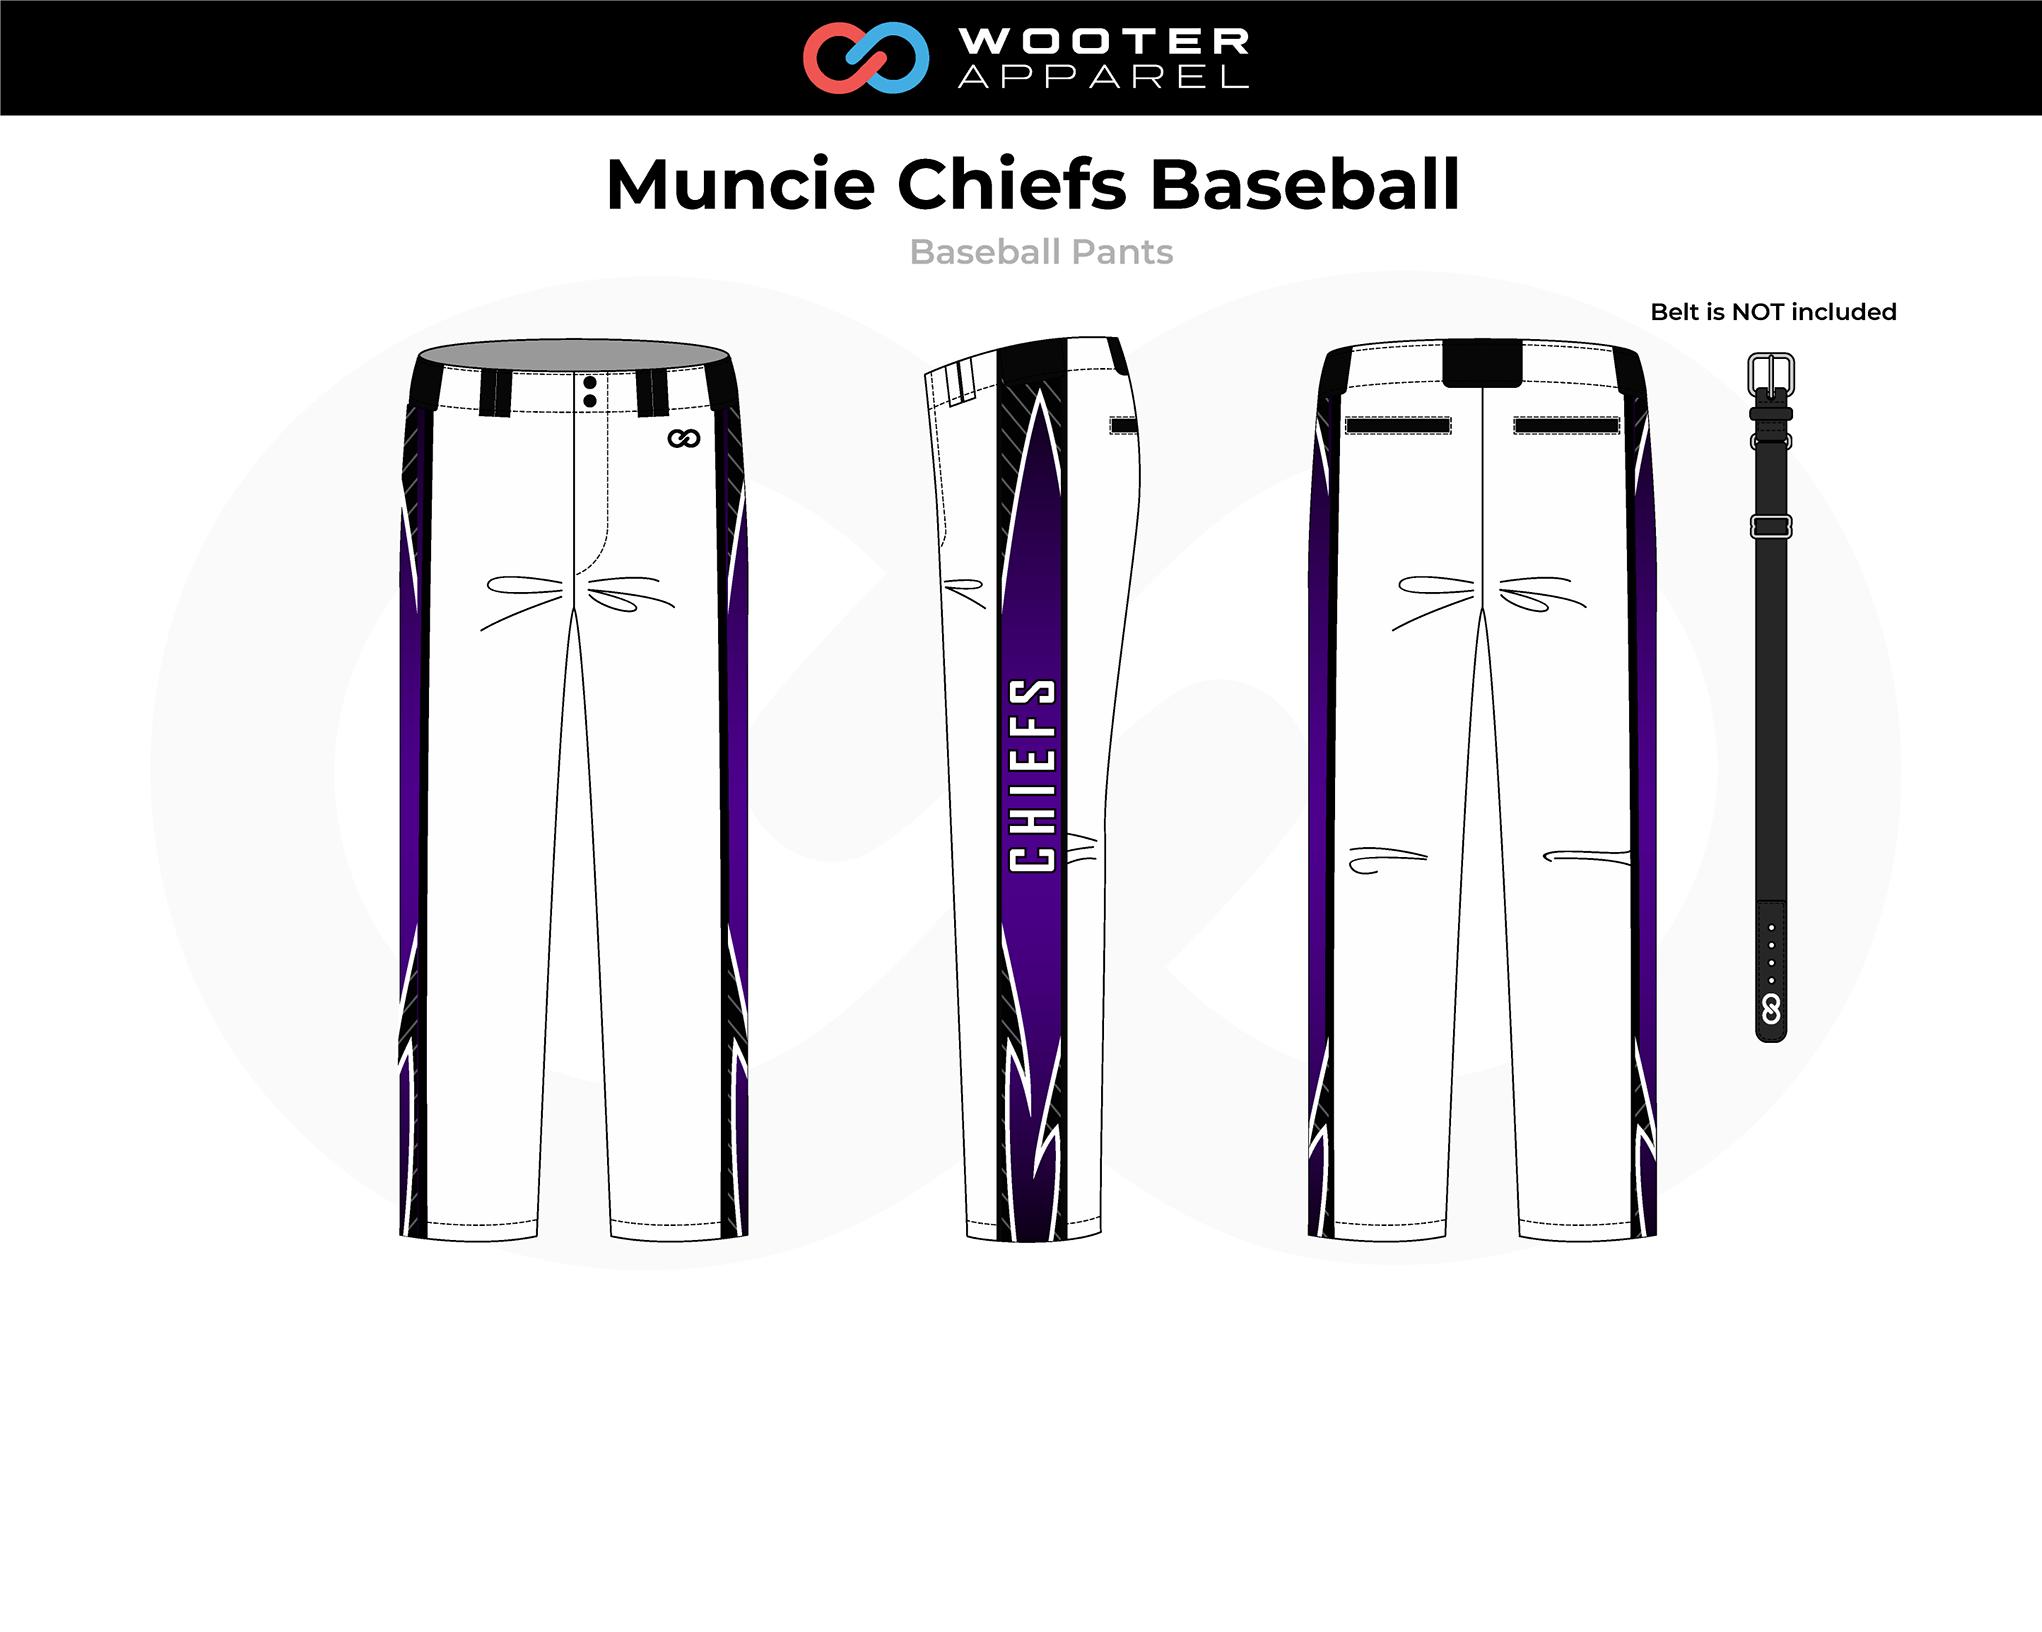 MUNCIE CHIEFS Lavender Black White Baseball Pants